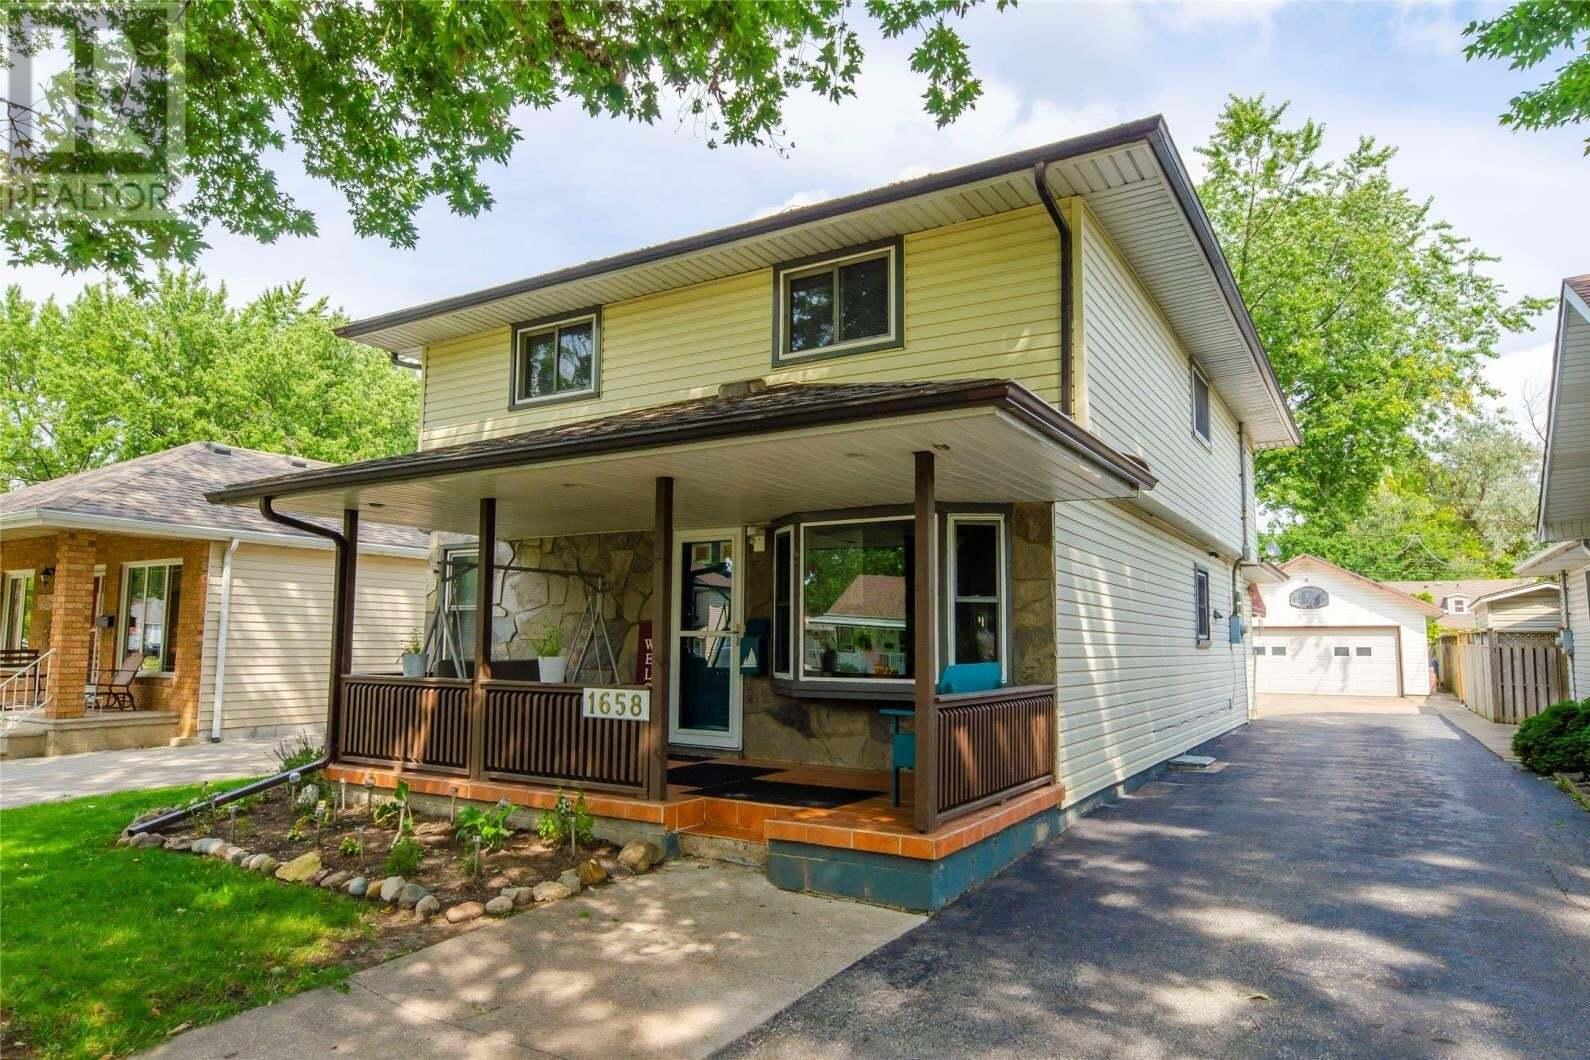 House for sale at 1658 Buckingham  Windsor Ontario - MLS: 20011445